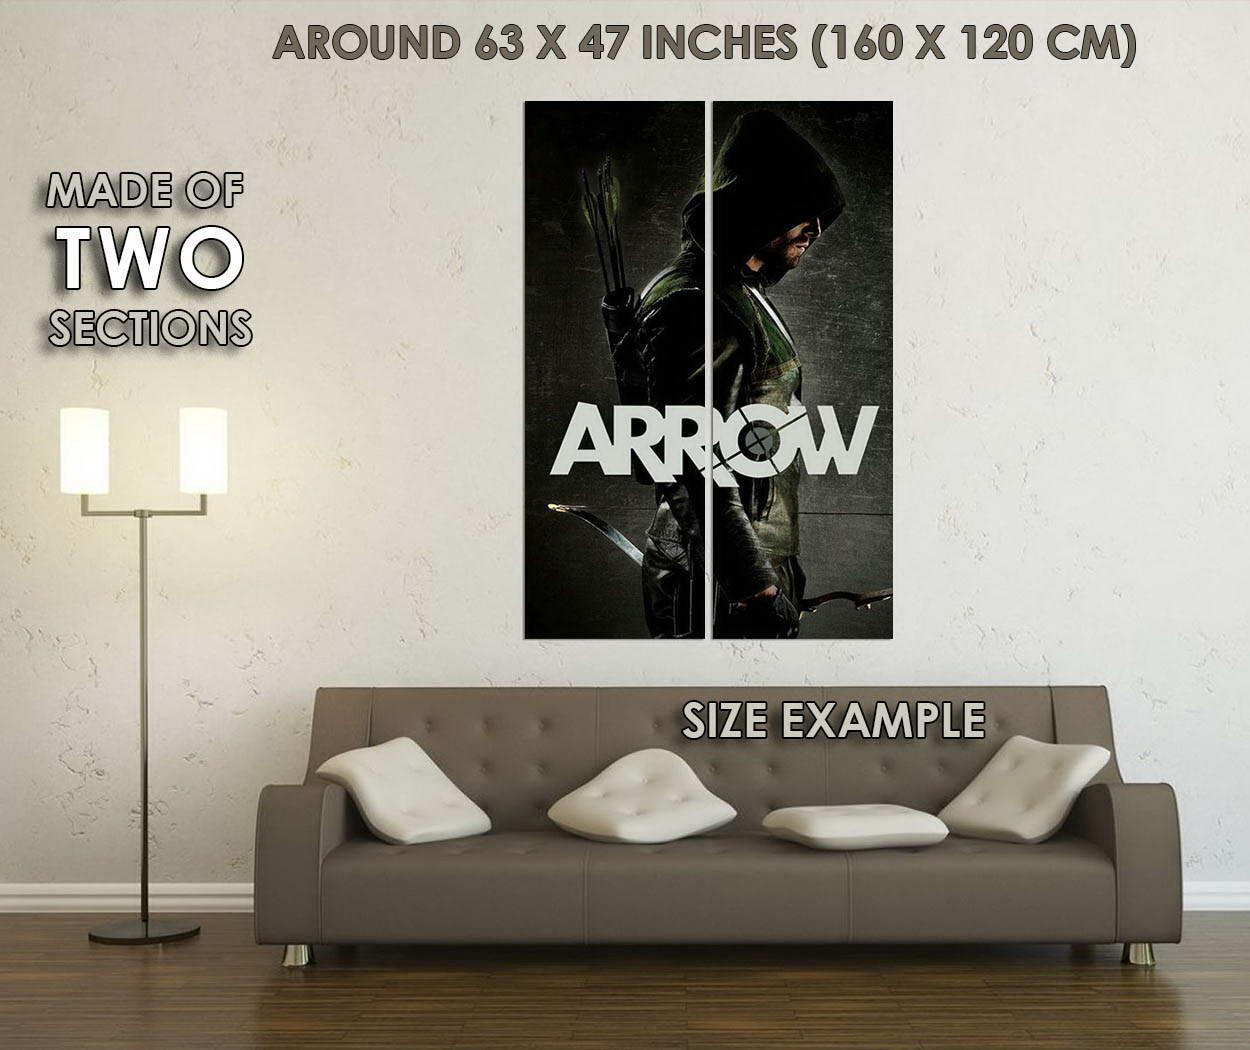 10594-The-Arrow-Superheroes-TV-Series-Art-LAMINATED-POSTER-CA thumbnail 6